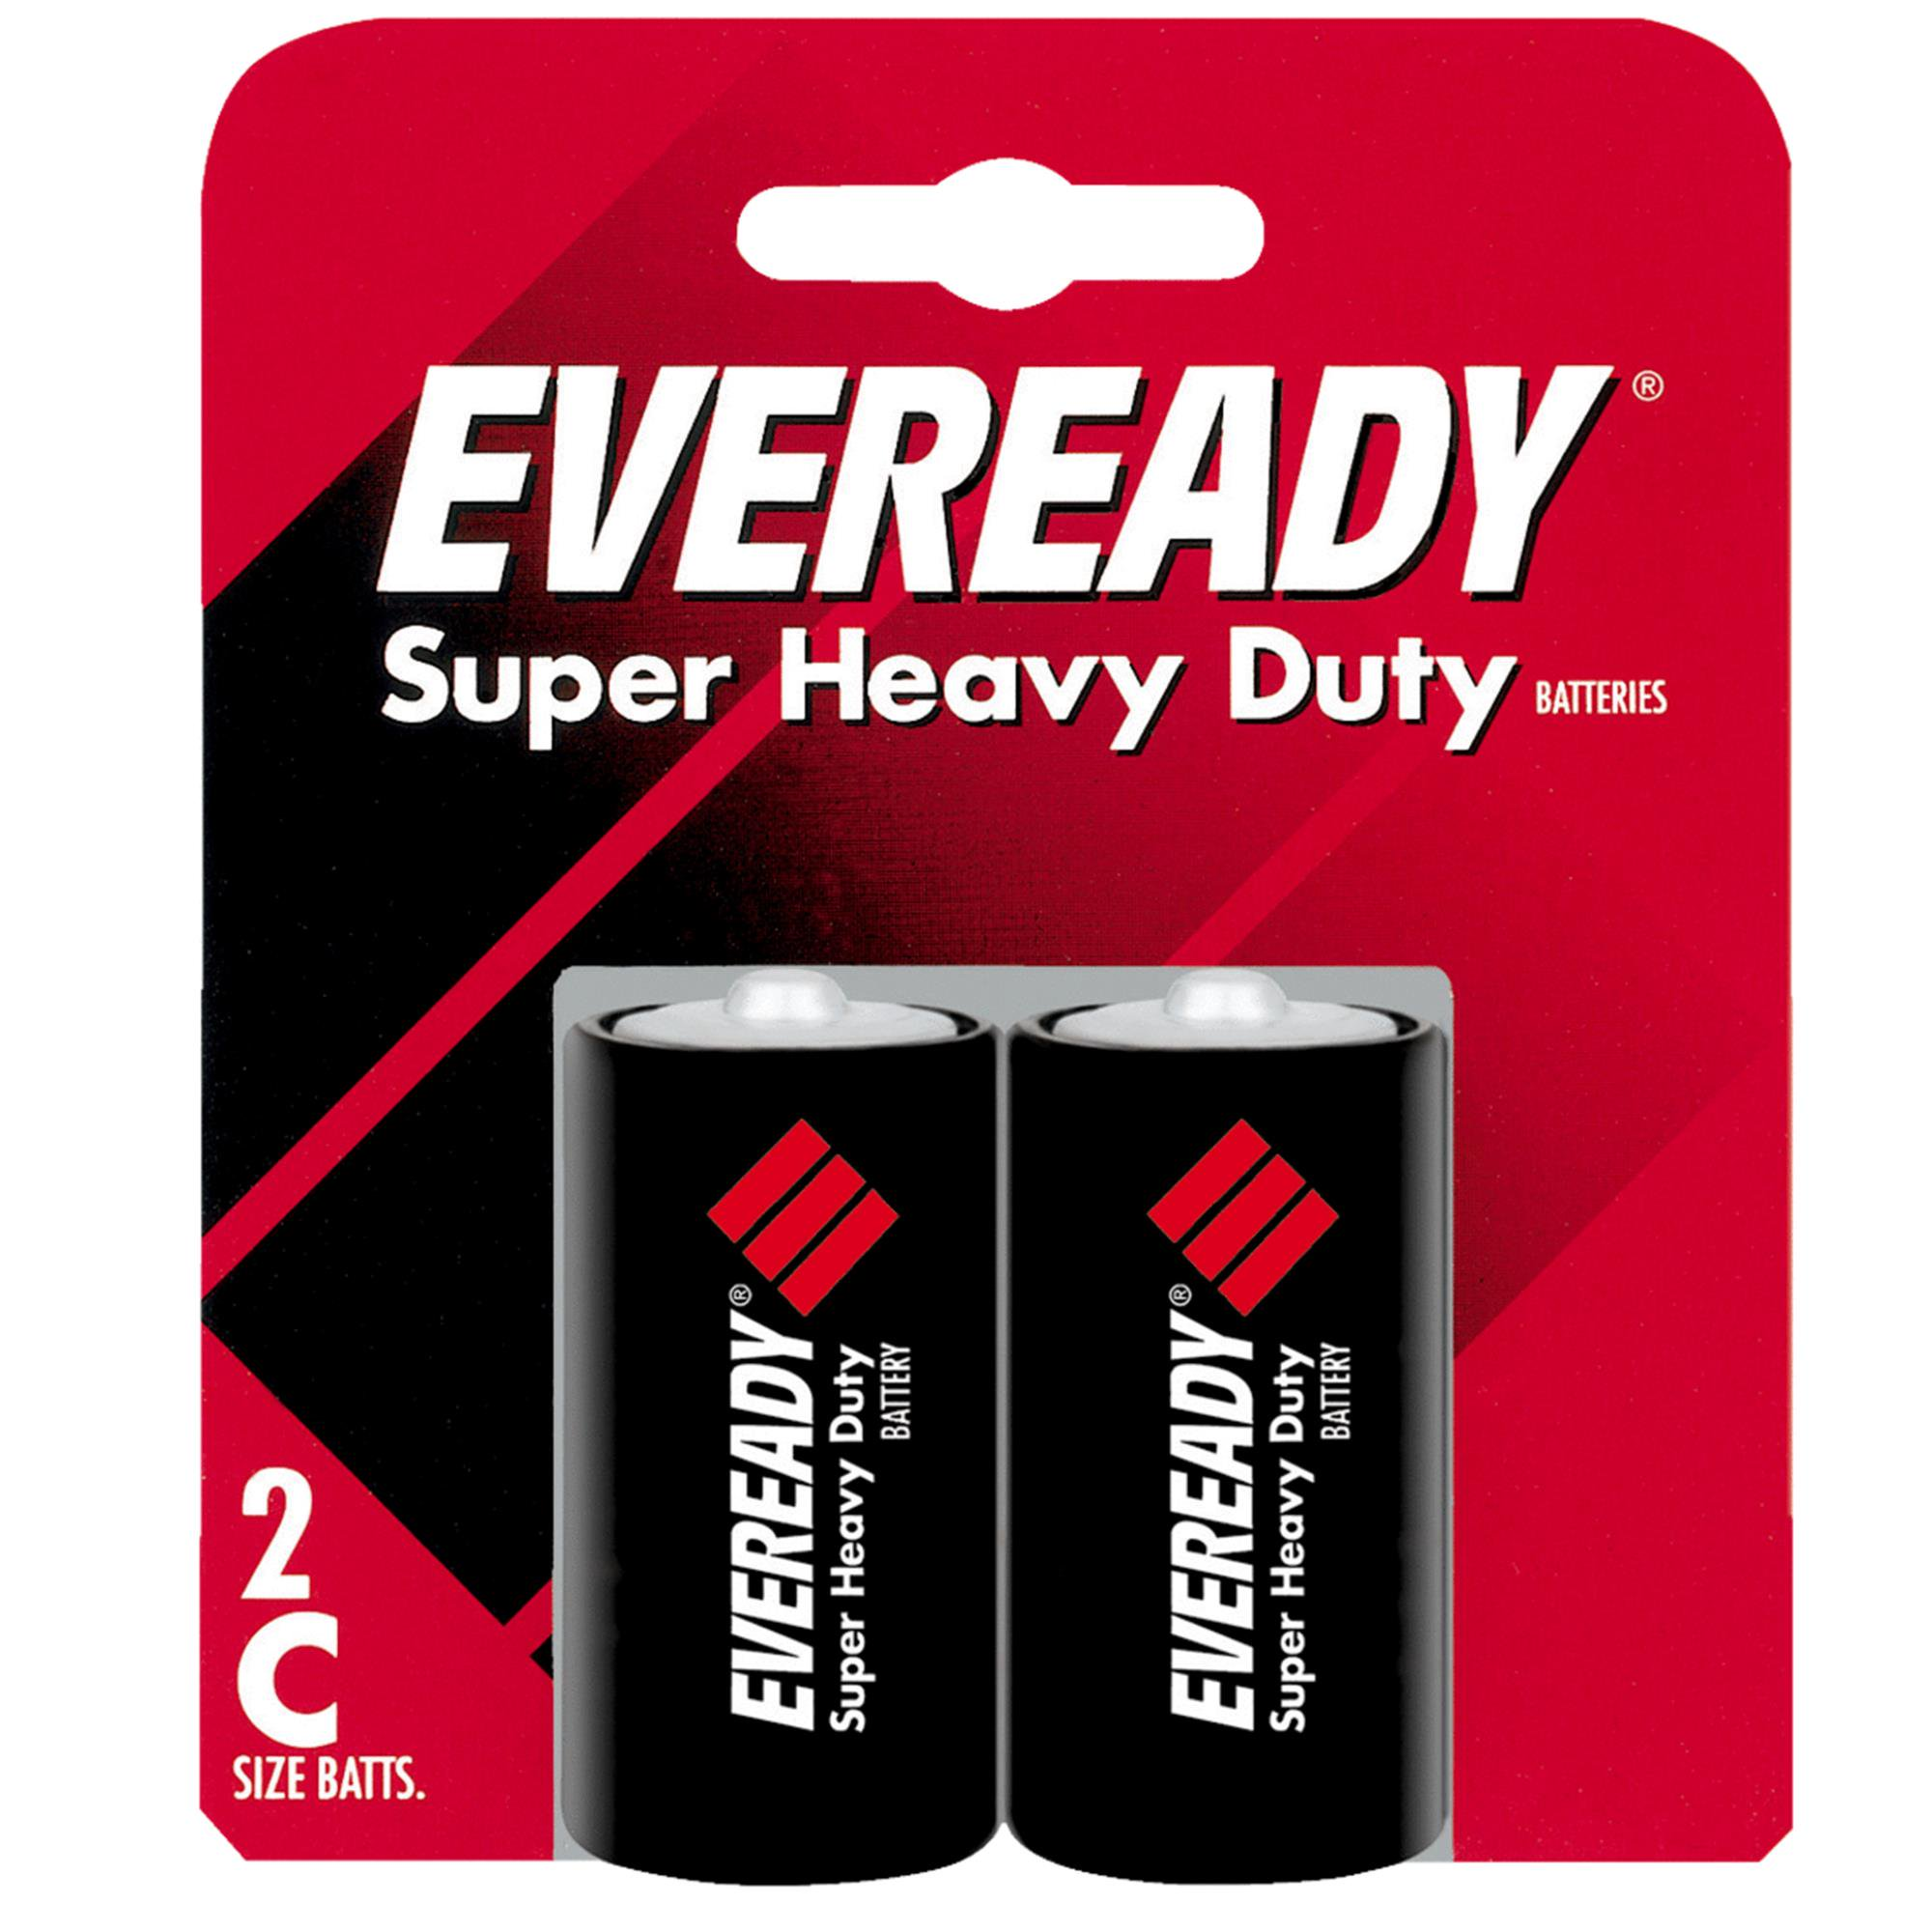 Eveready Super Heavy Duty C Carbon Zinc Battery